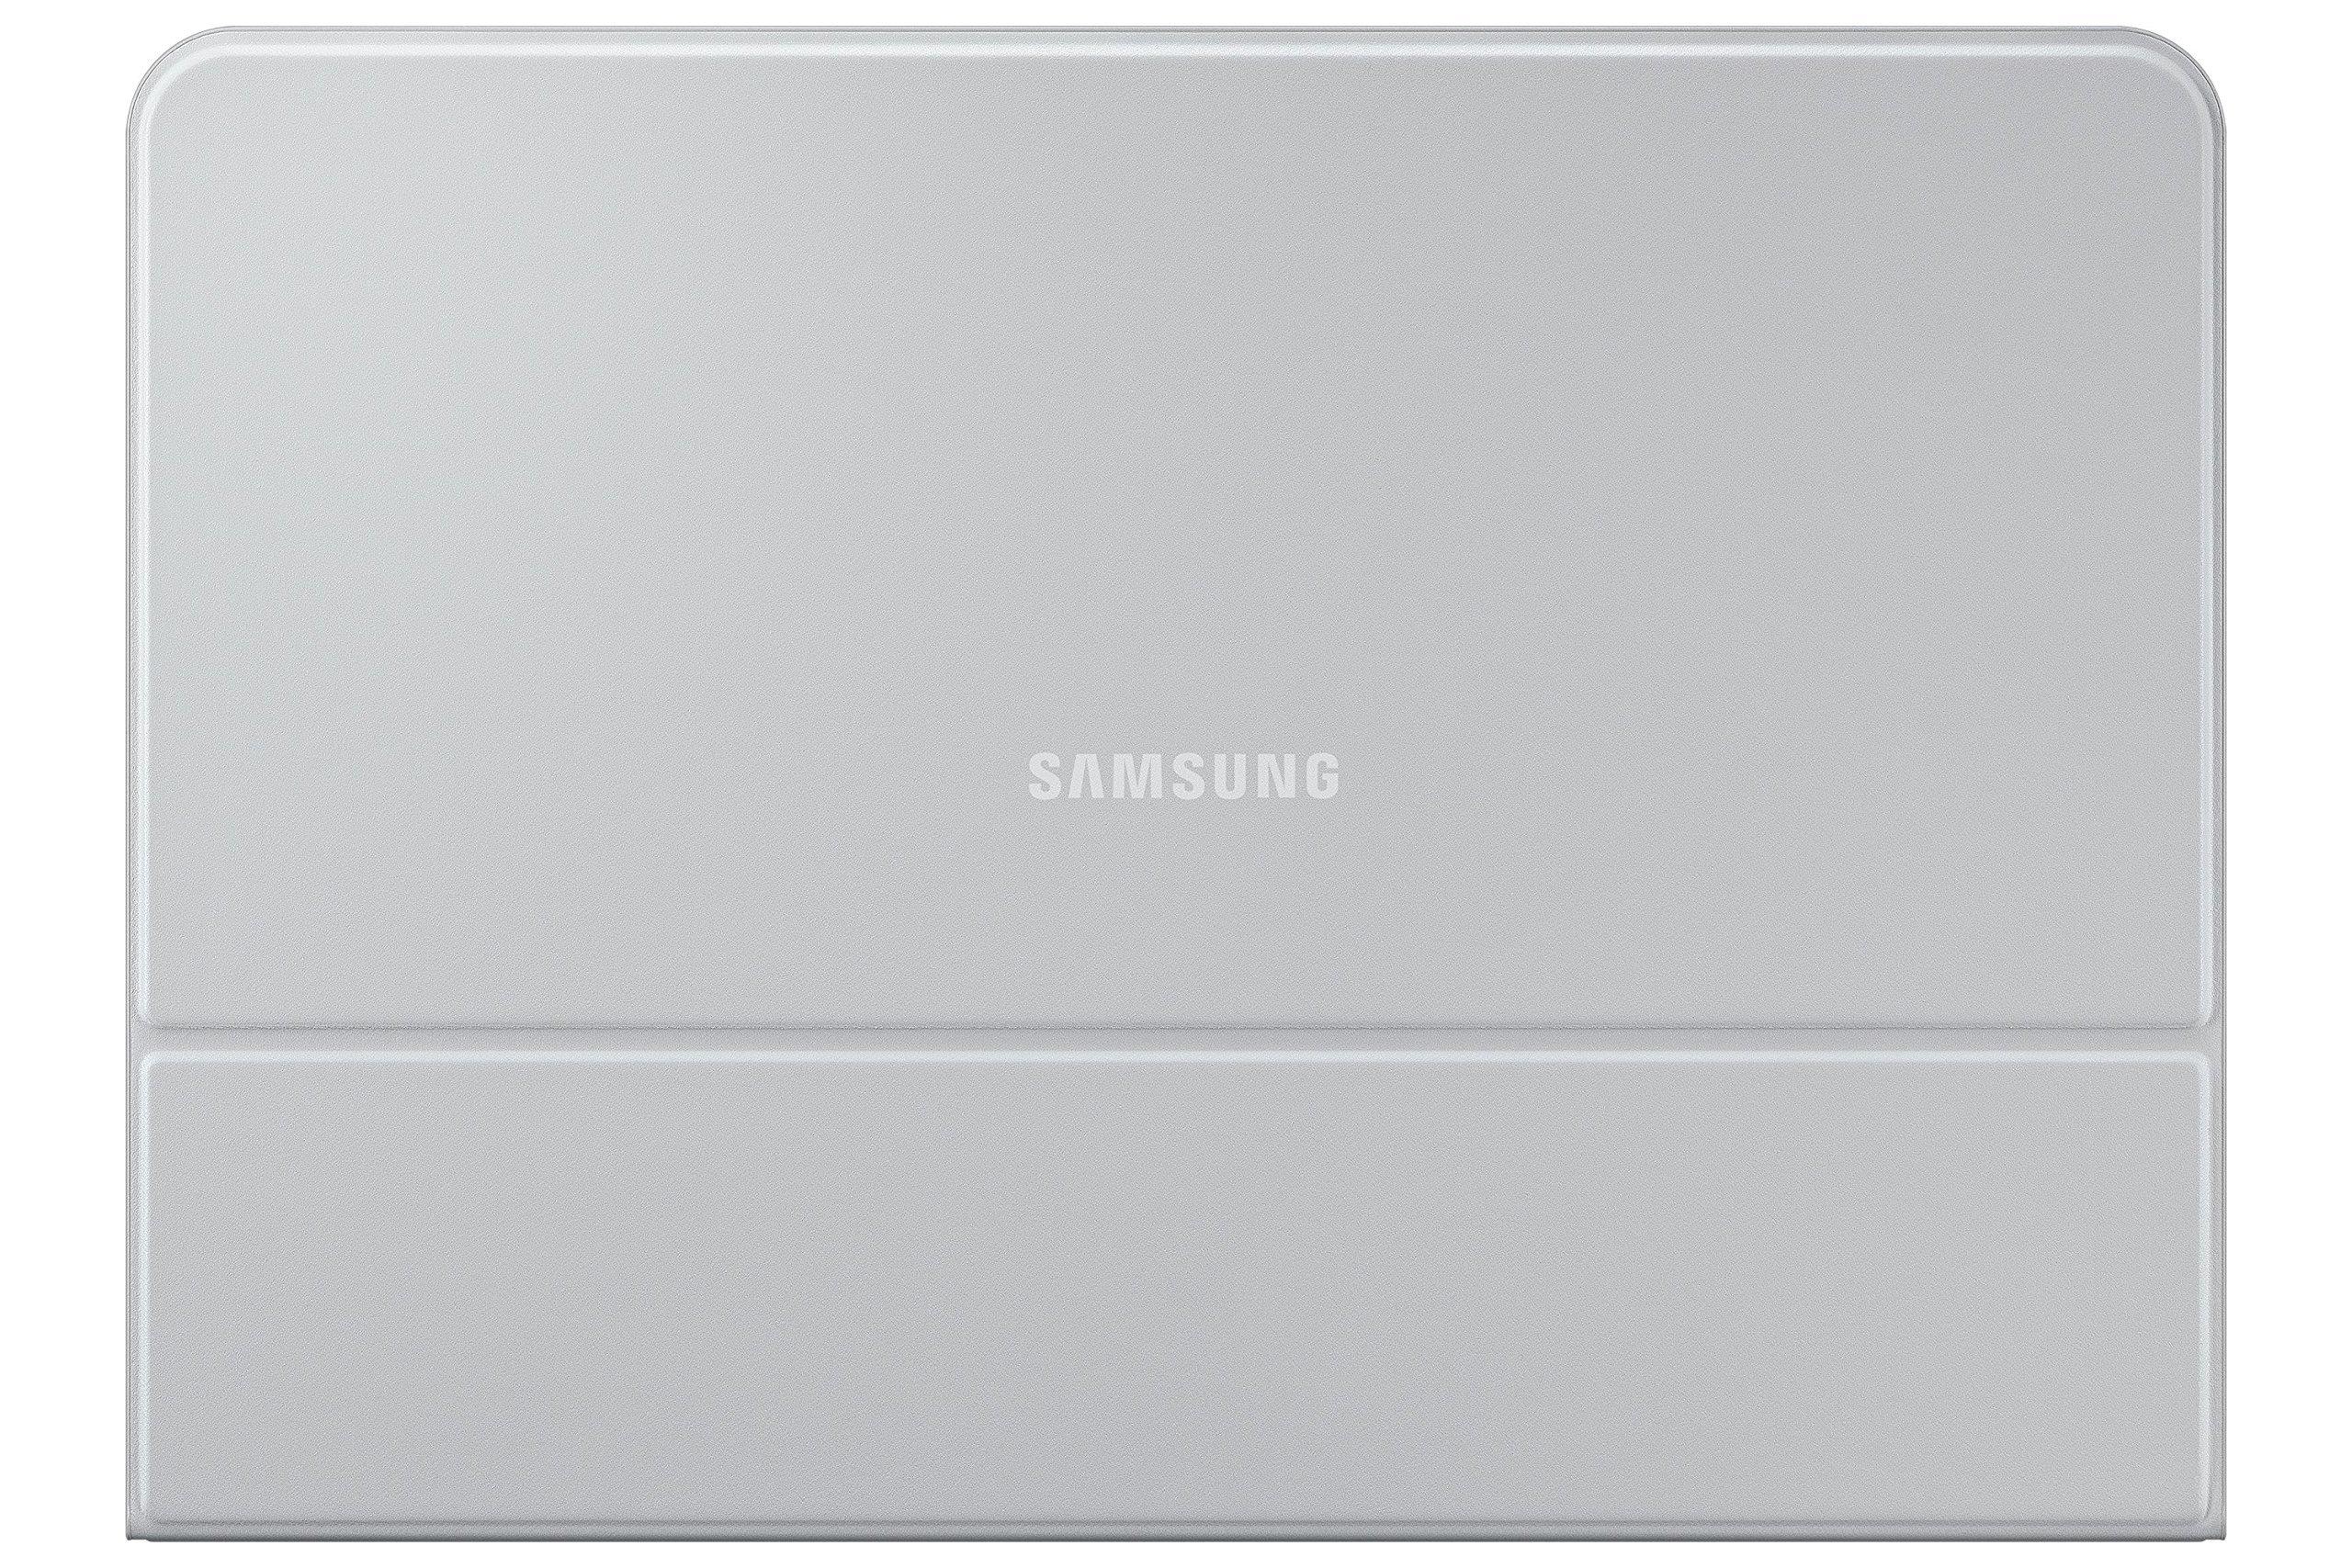 Funda + Teclado Galaxy Tab S3 9.7 SAMSUNG [6VSWQDHJ]